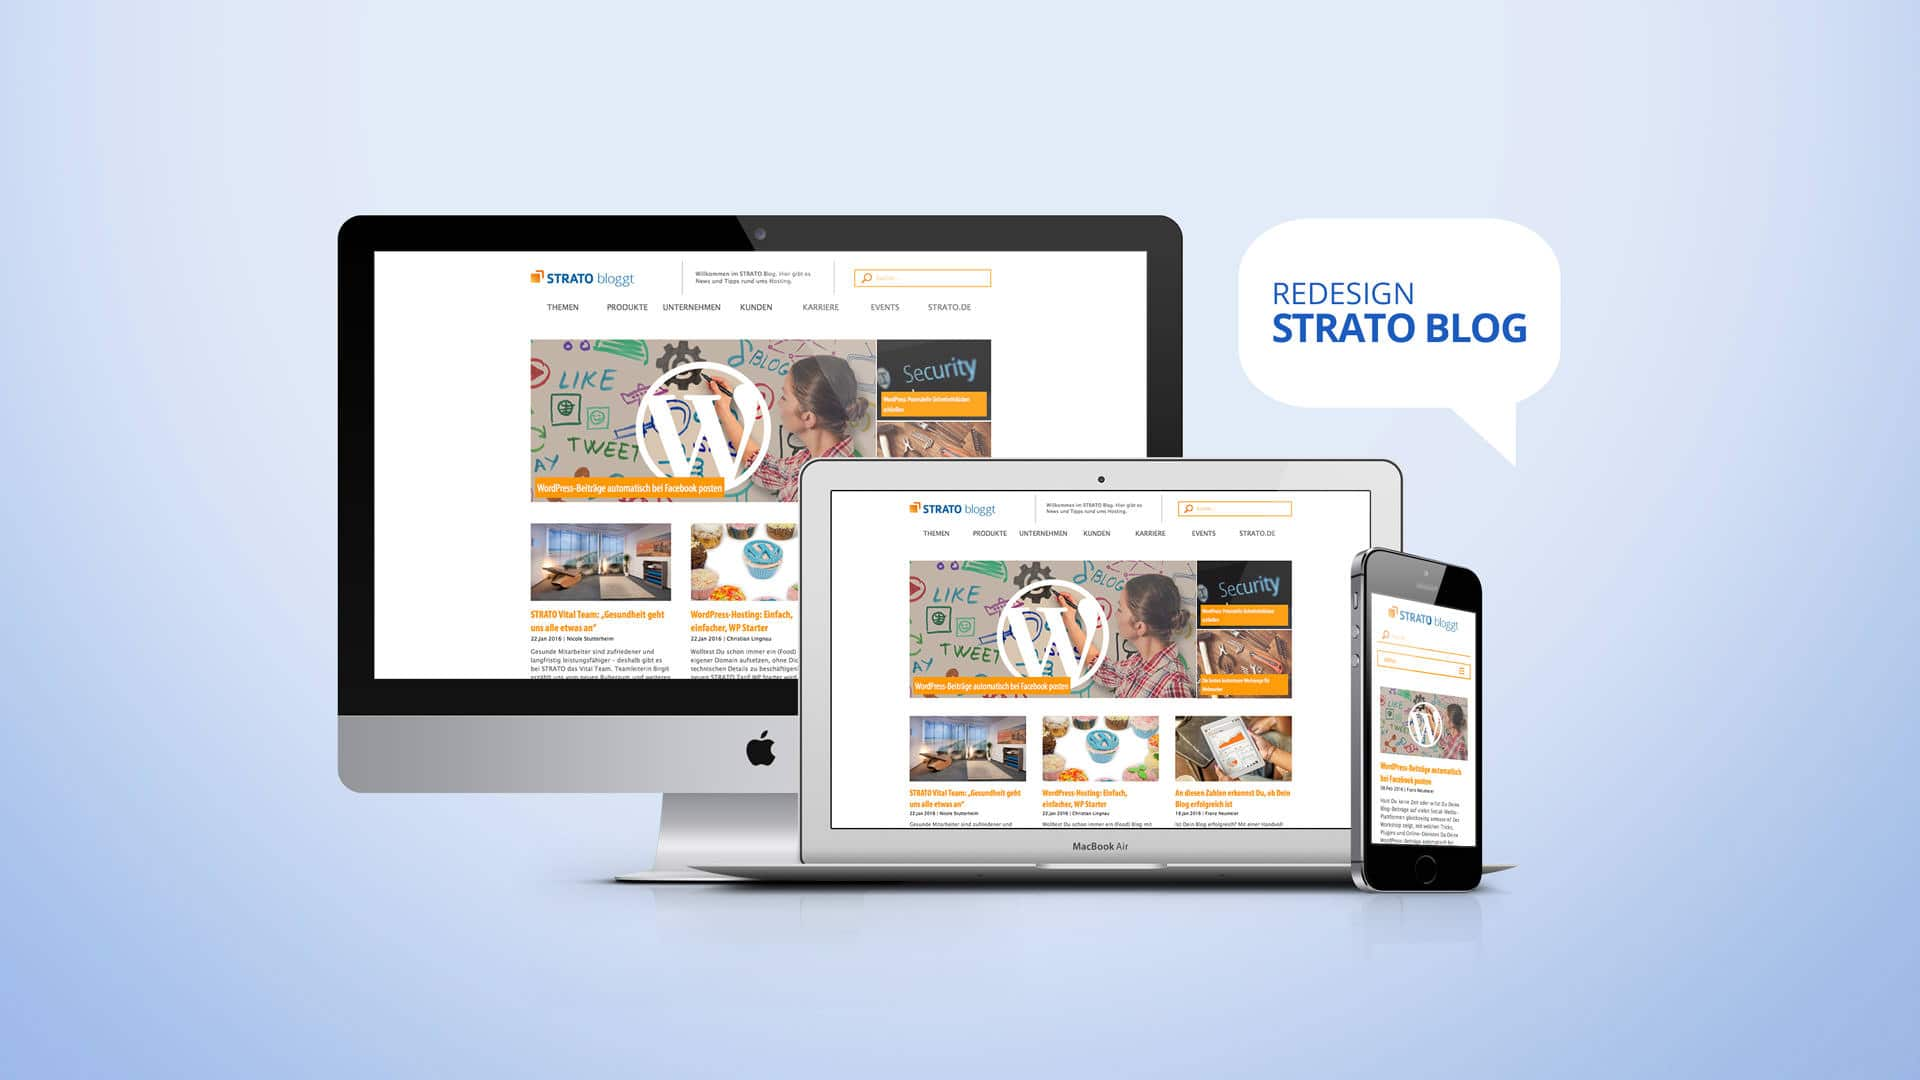 Redesign: Strato Blog